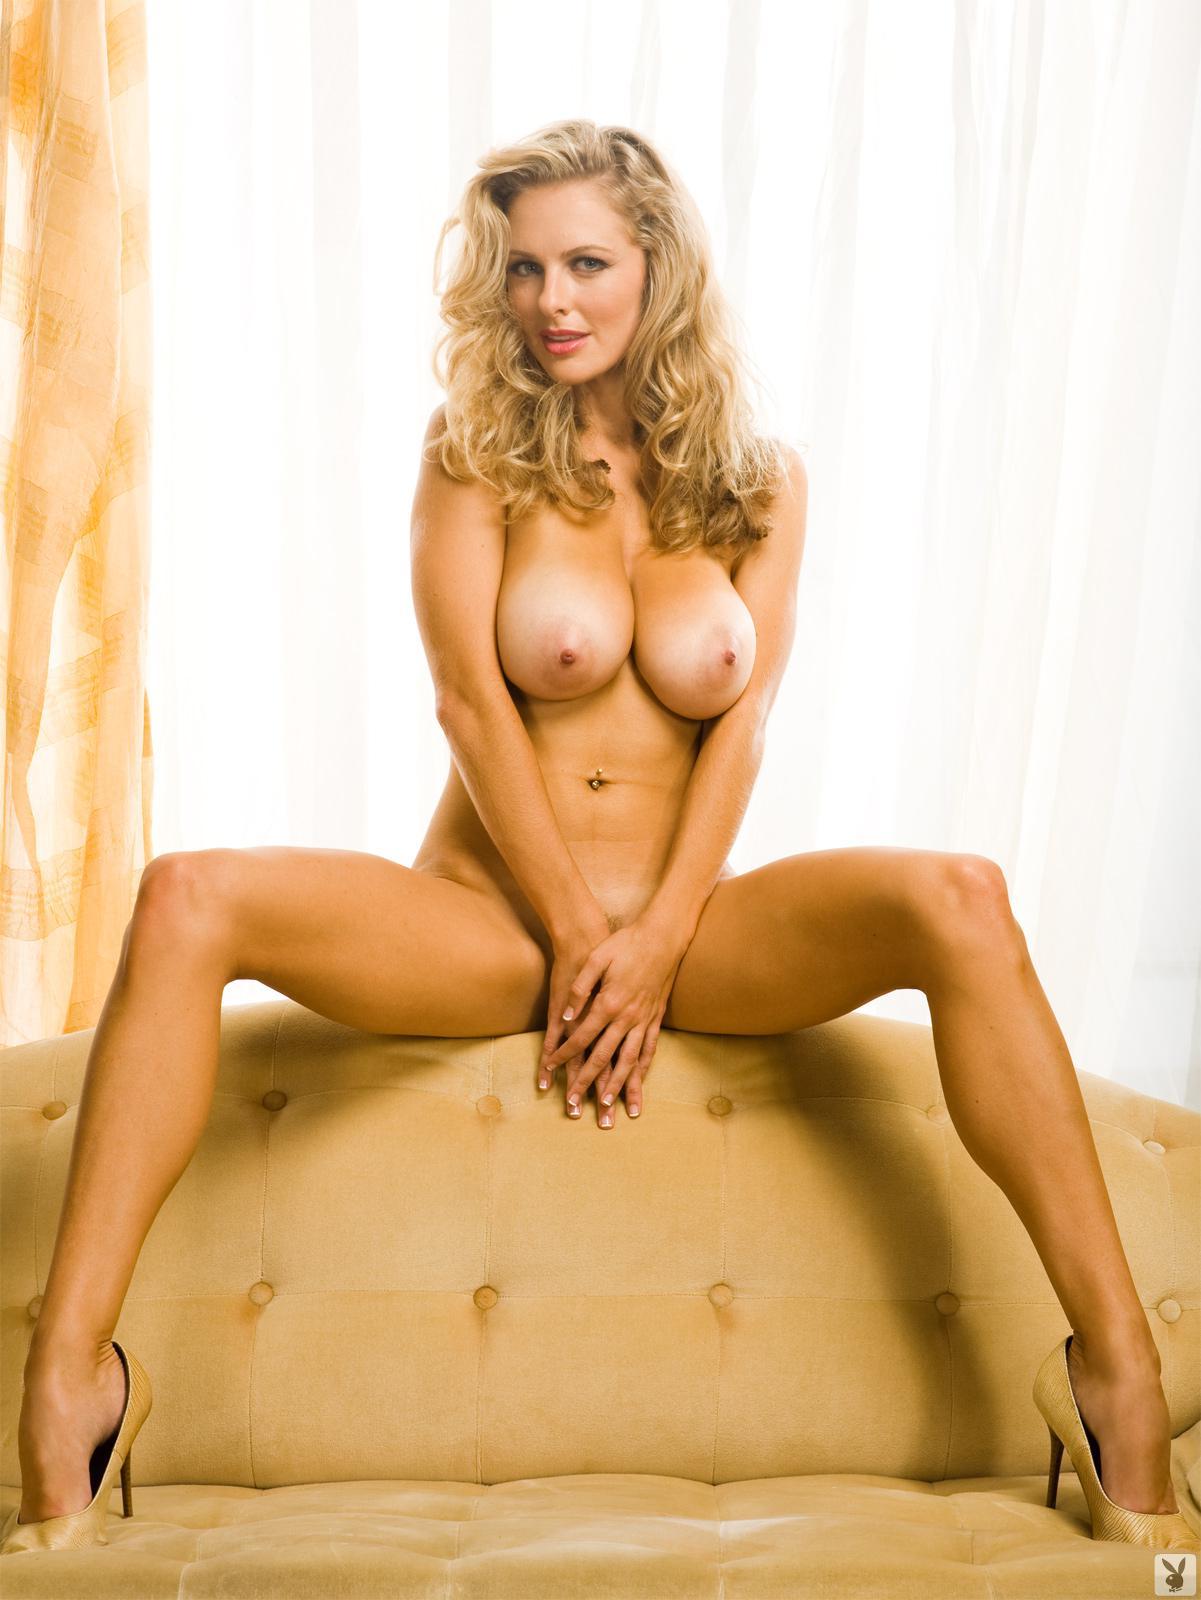 Sylvia ester nude pics